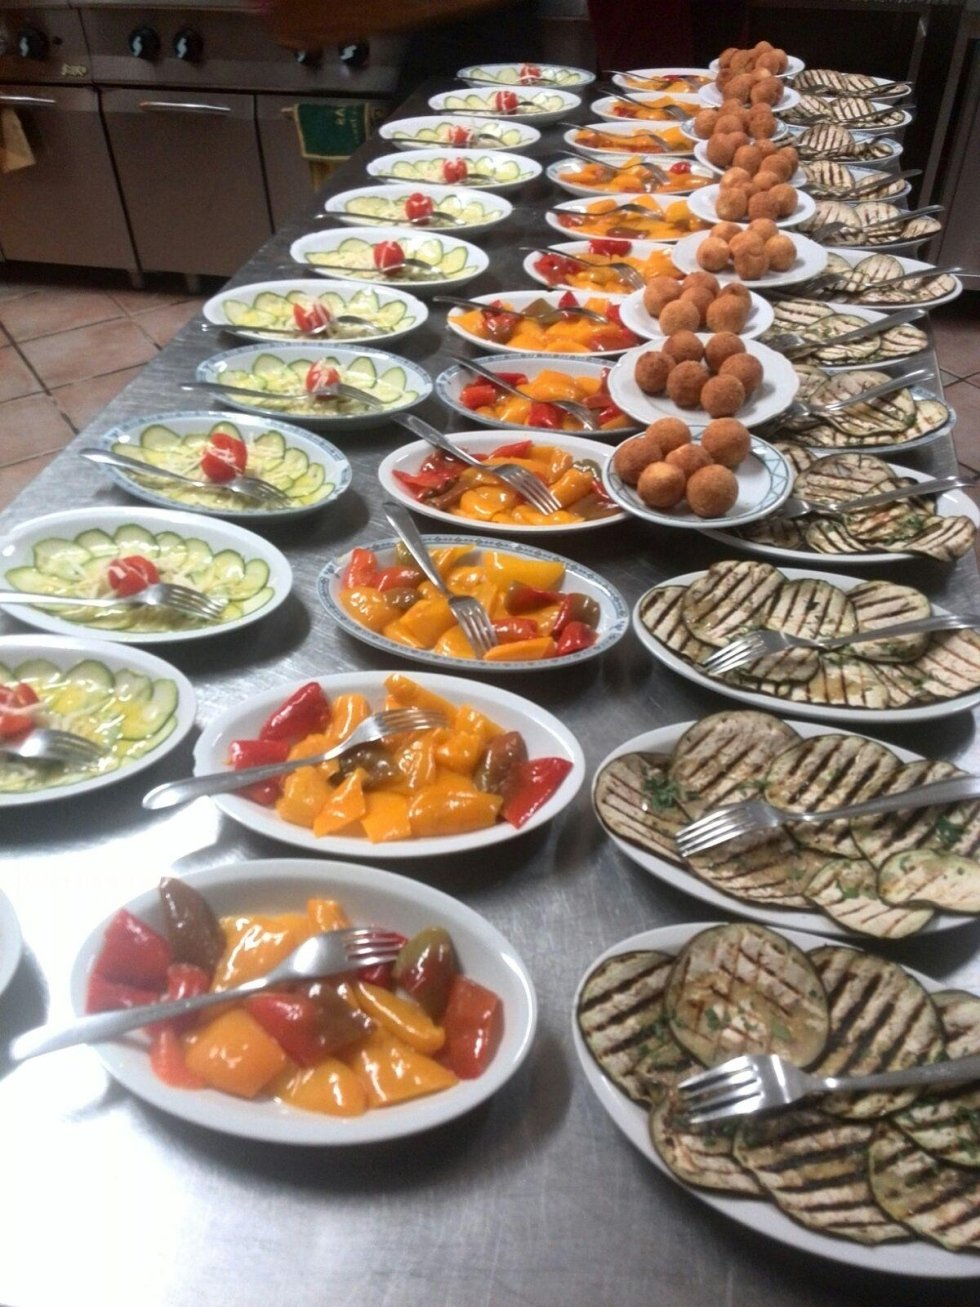 cucina gallurese Olbia